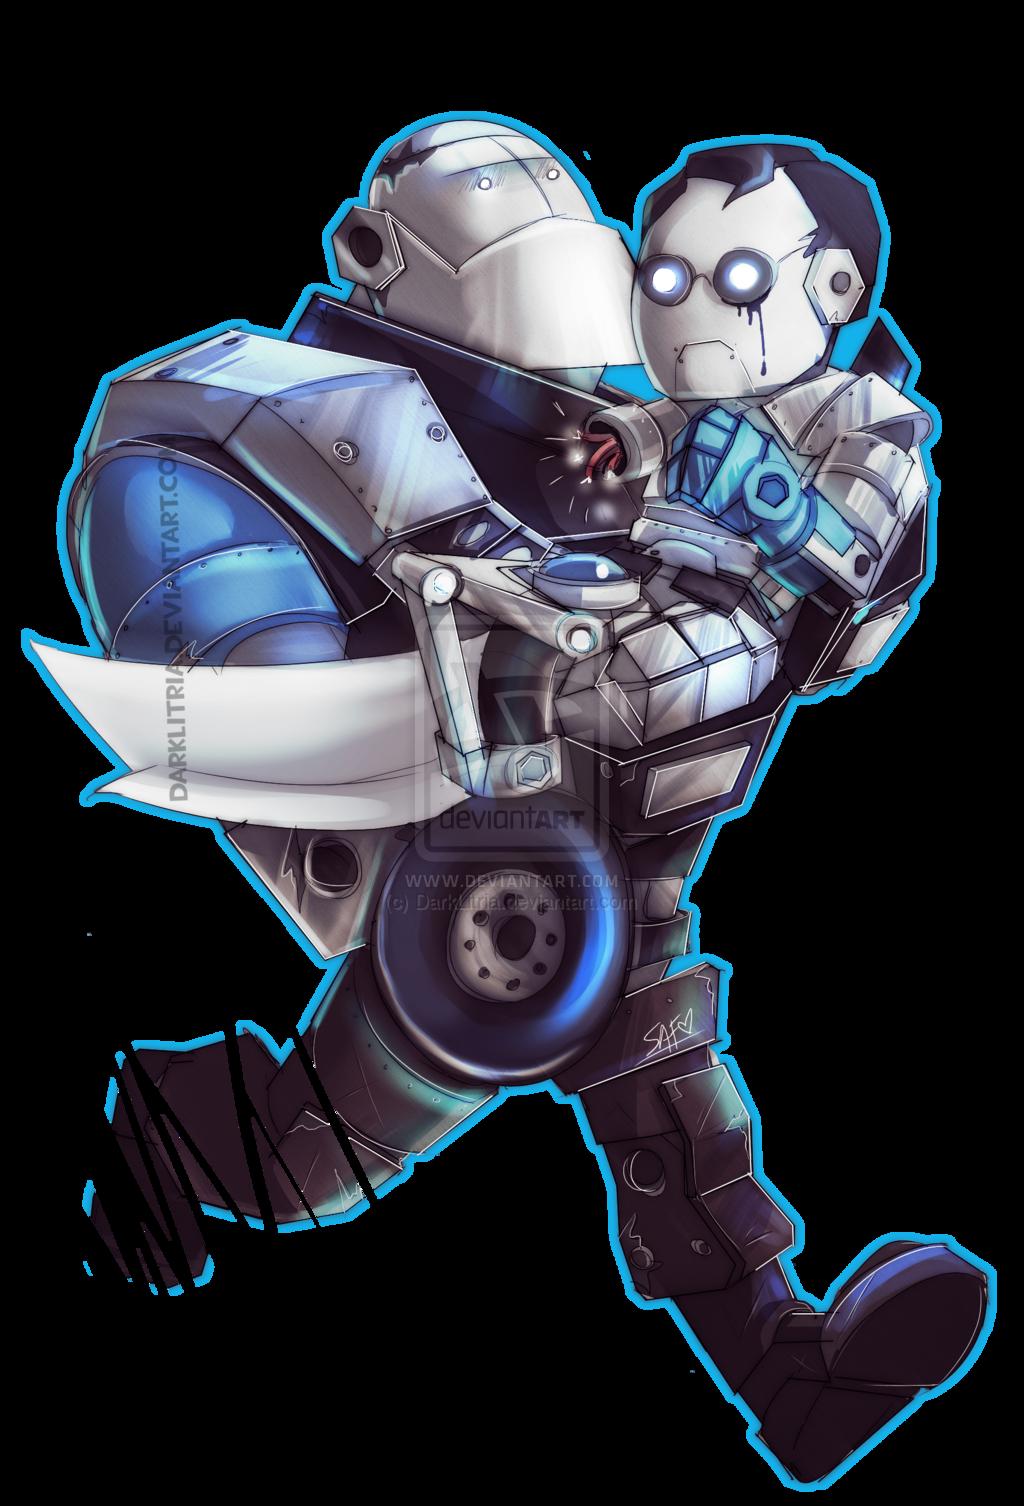 TF2: Strangle by DarkLitria on deviantART | Team fortress